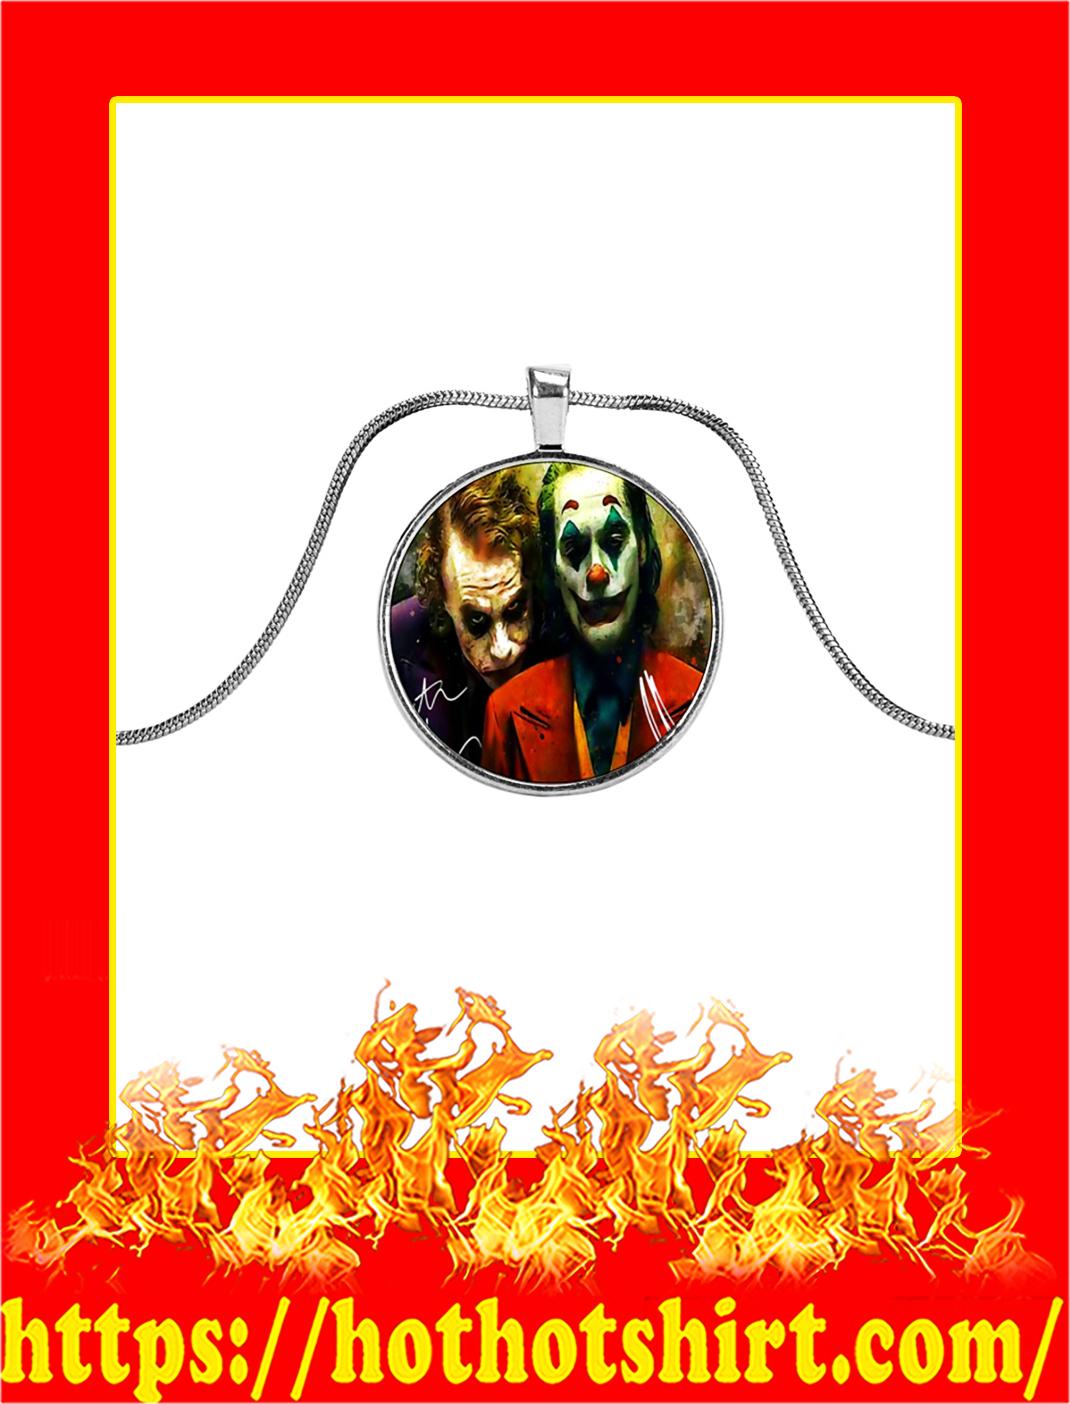 Joker Joaquin Phoenix and Heath Ledger Signature Necklace